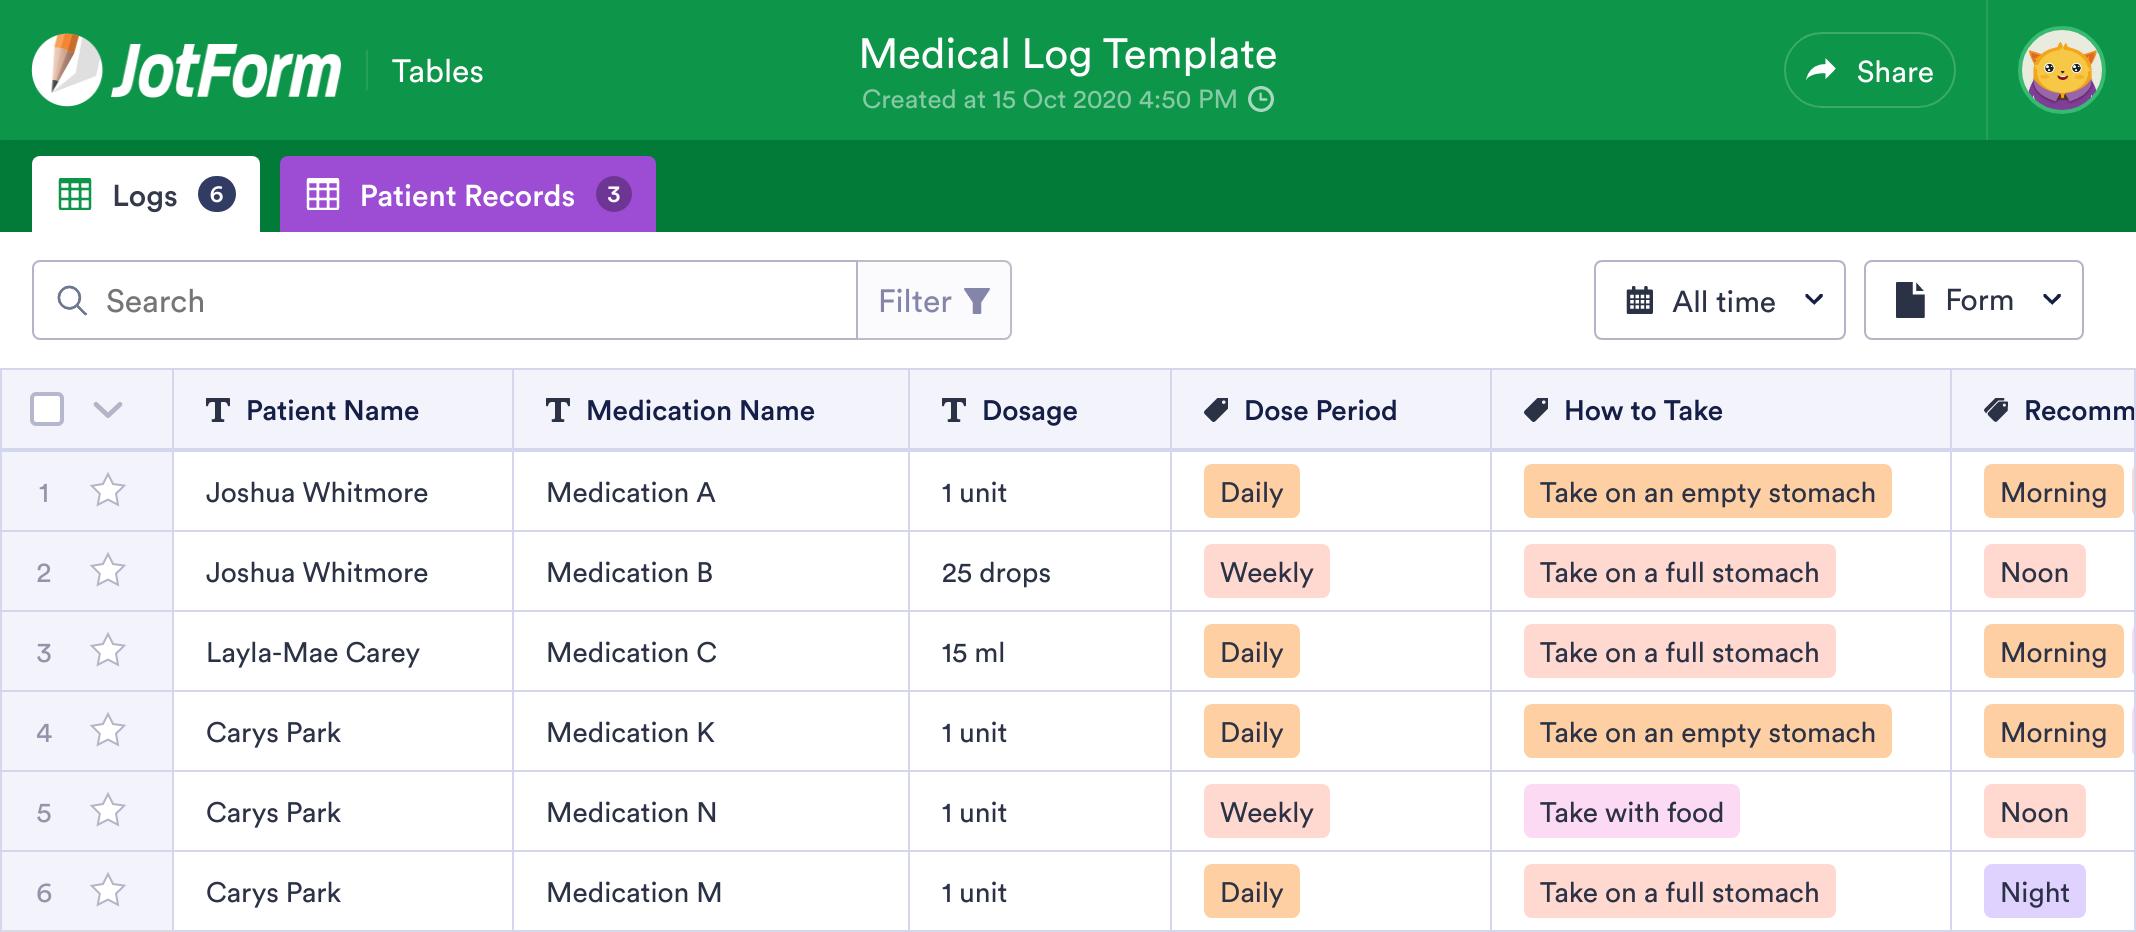 Medical Log Template